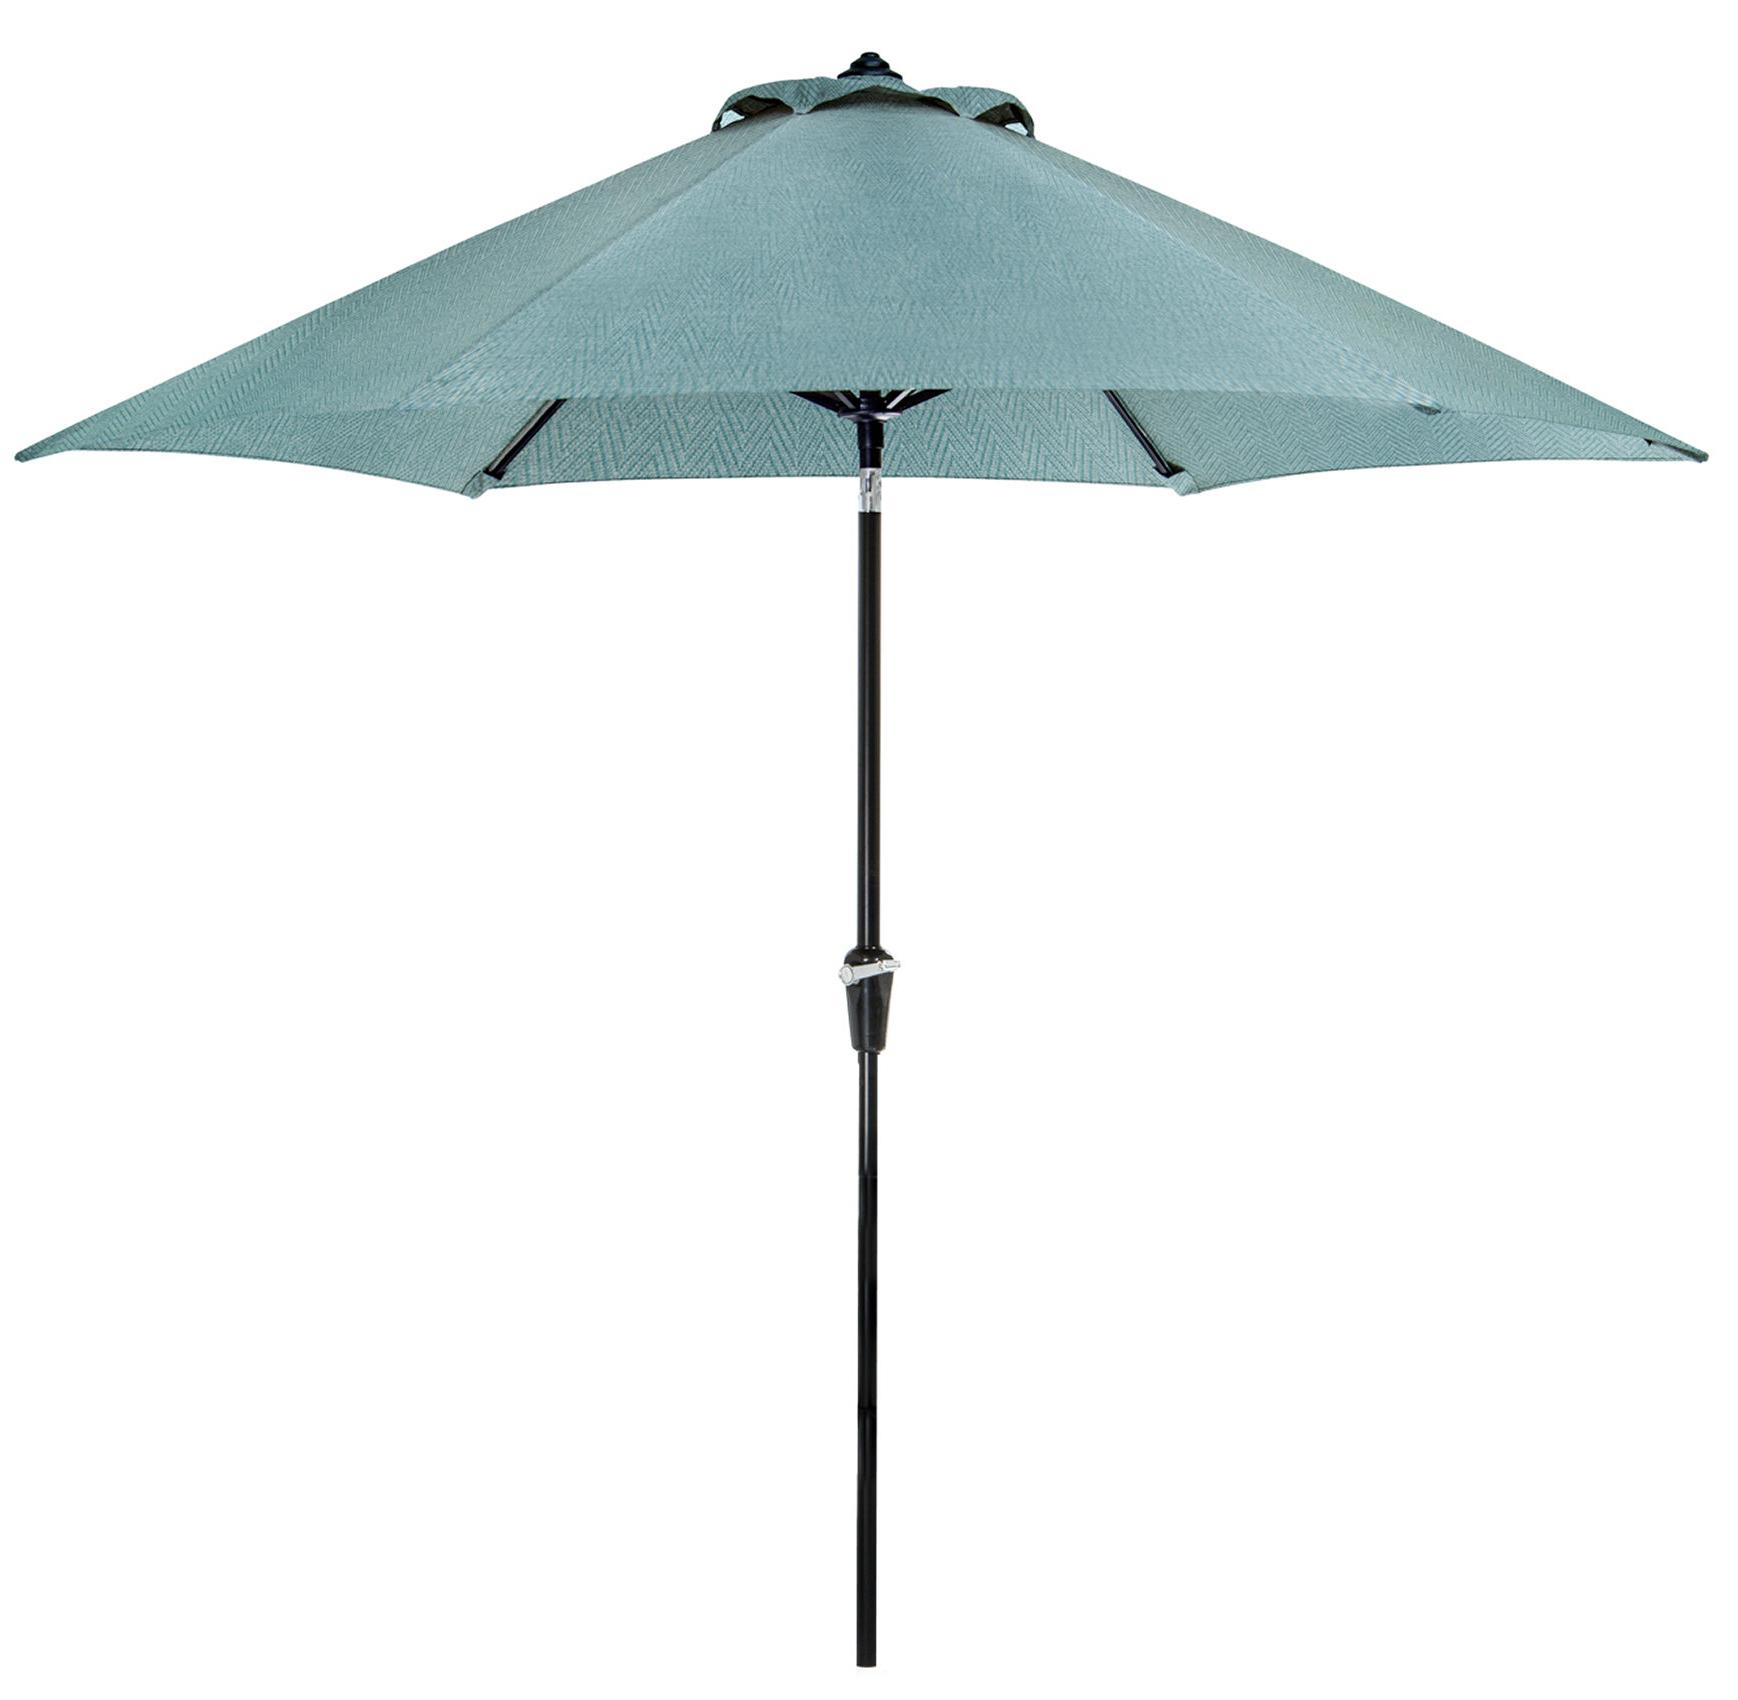 Preferred Muldoon Market Umbrellas For Bozarth (View 15 of 20)